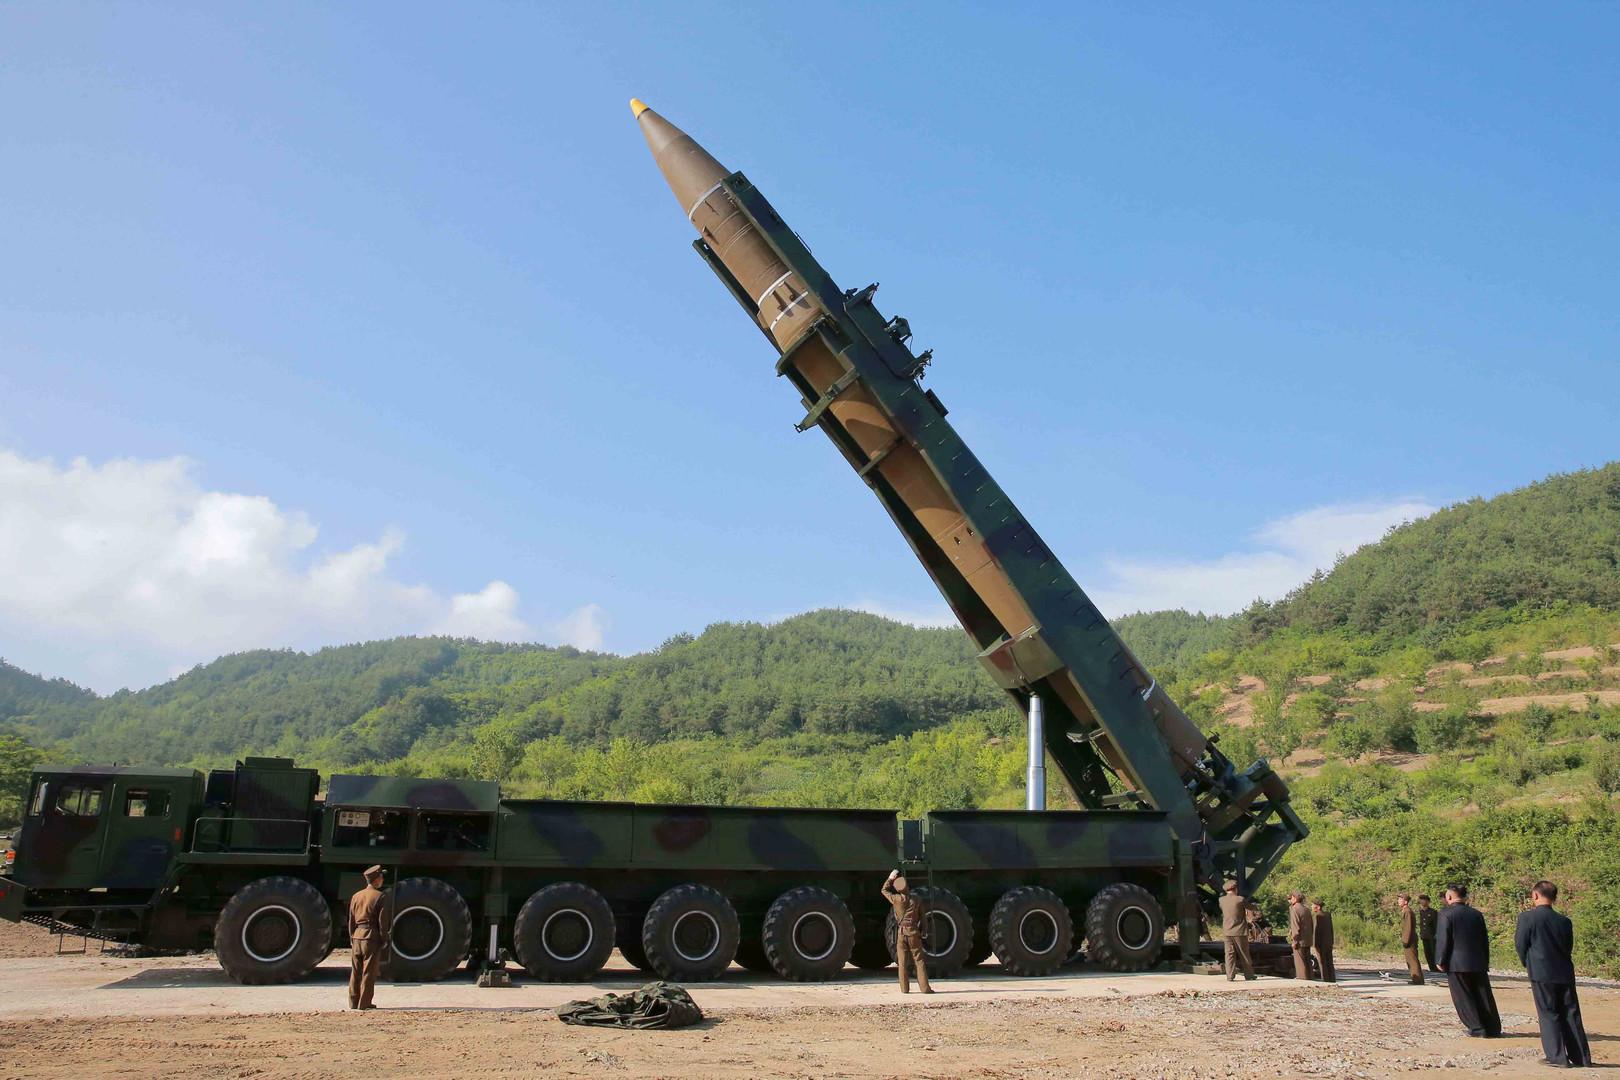 """Globale Bedrohung "": USA reagieren mit Raketenabschuss auf nordkoreanischen Raketentest"